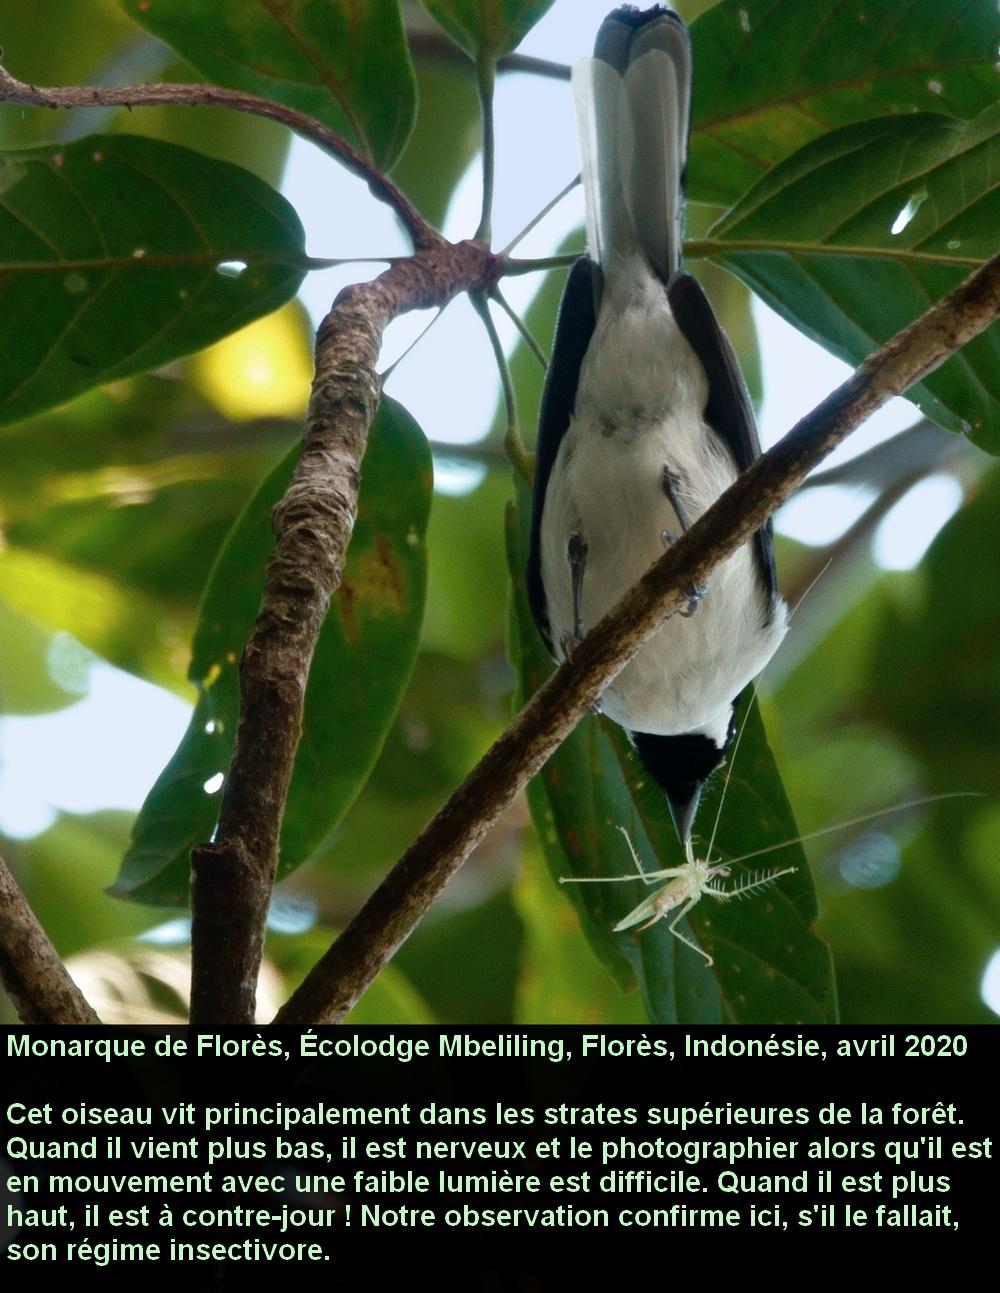 Symposiachrus_sacerdotum_3fr_mbeliling_ecolodge_flores_indonesie_insecte